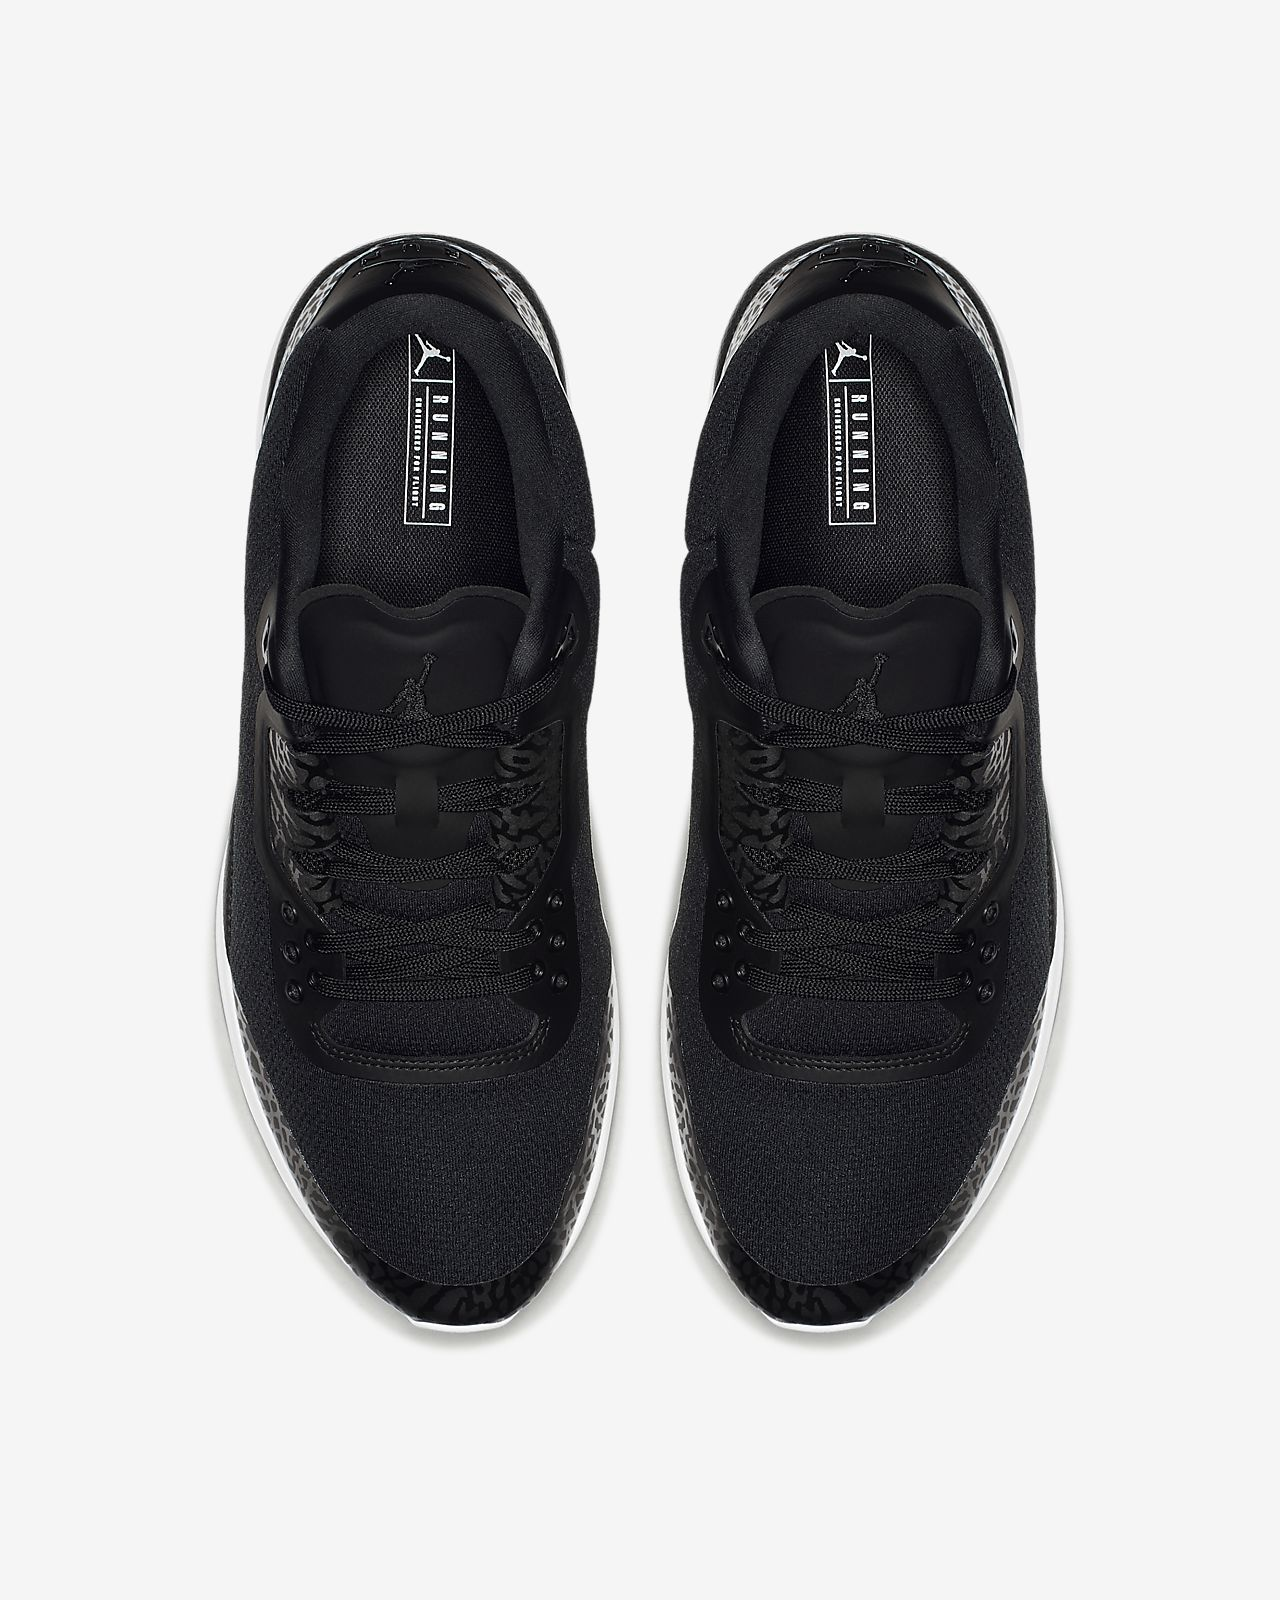 brand new 23747 b2cf7 ... Jordan Zoom Tenacity 88 Mens Running Shoe